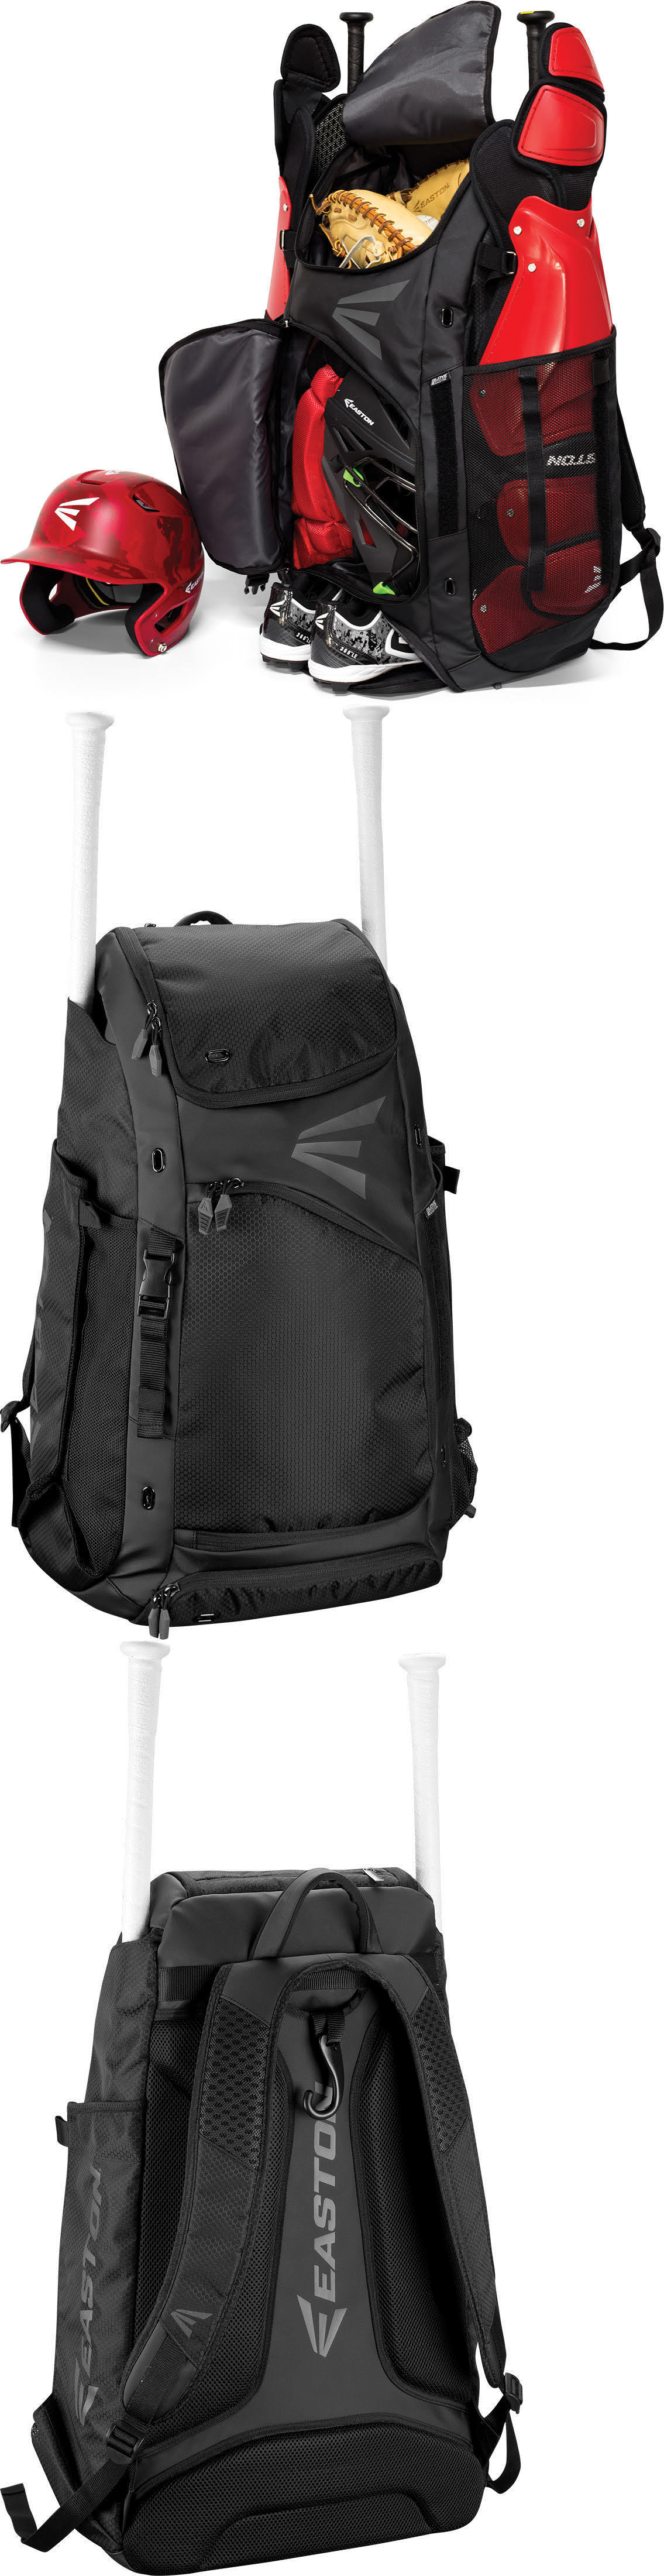 Equipment Bags 50807  Easton E610cbp Catchers Backpack ddeb89bdf387